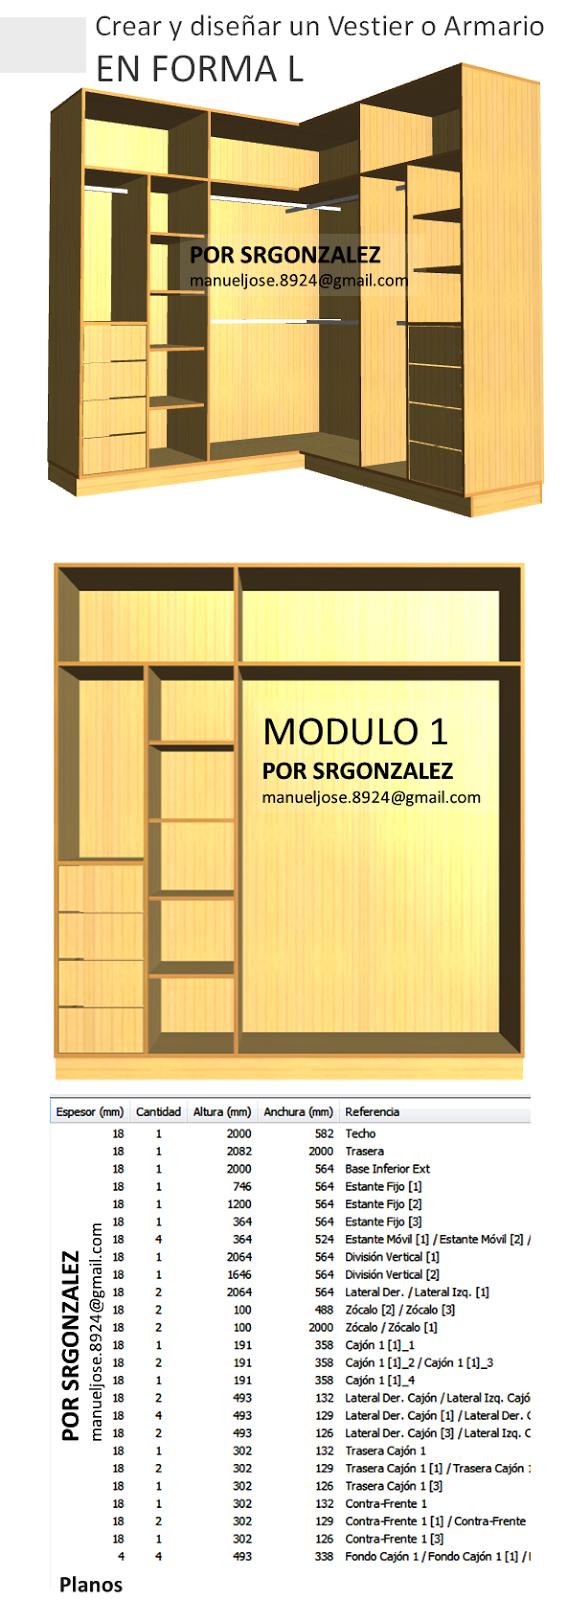 Dise os de muebles armarios cocinas bibliotecas etc for Programa para disenar muebles de madera